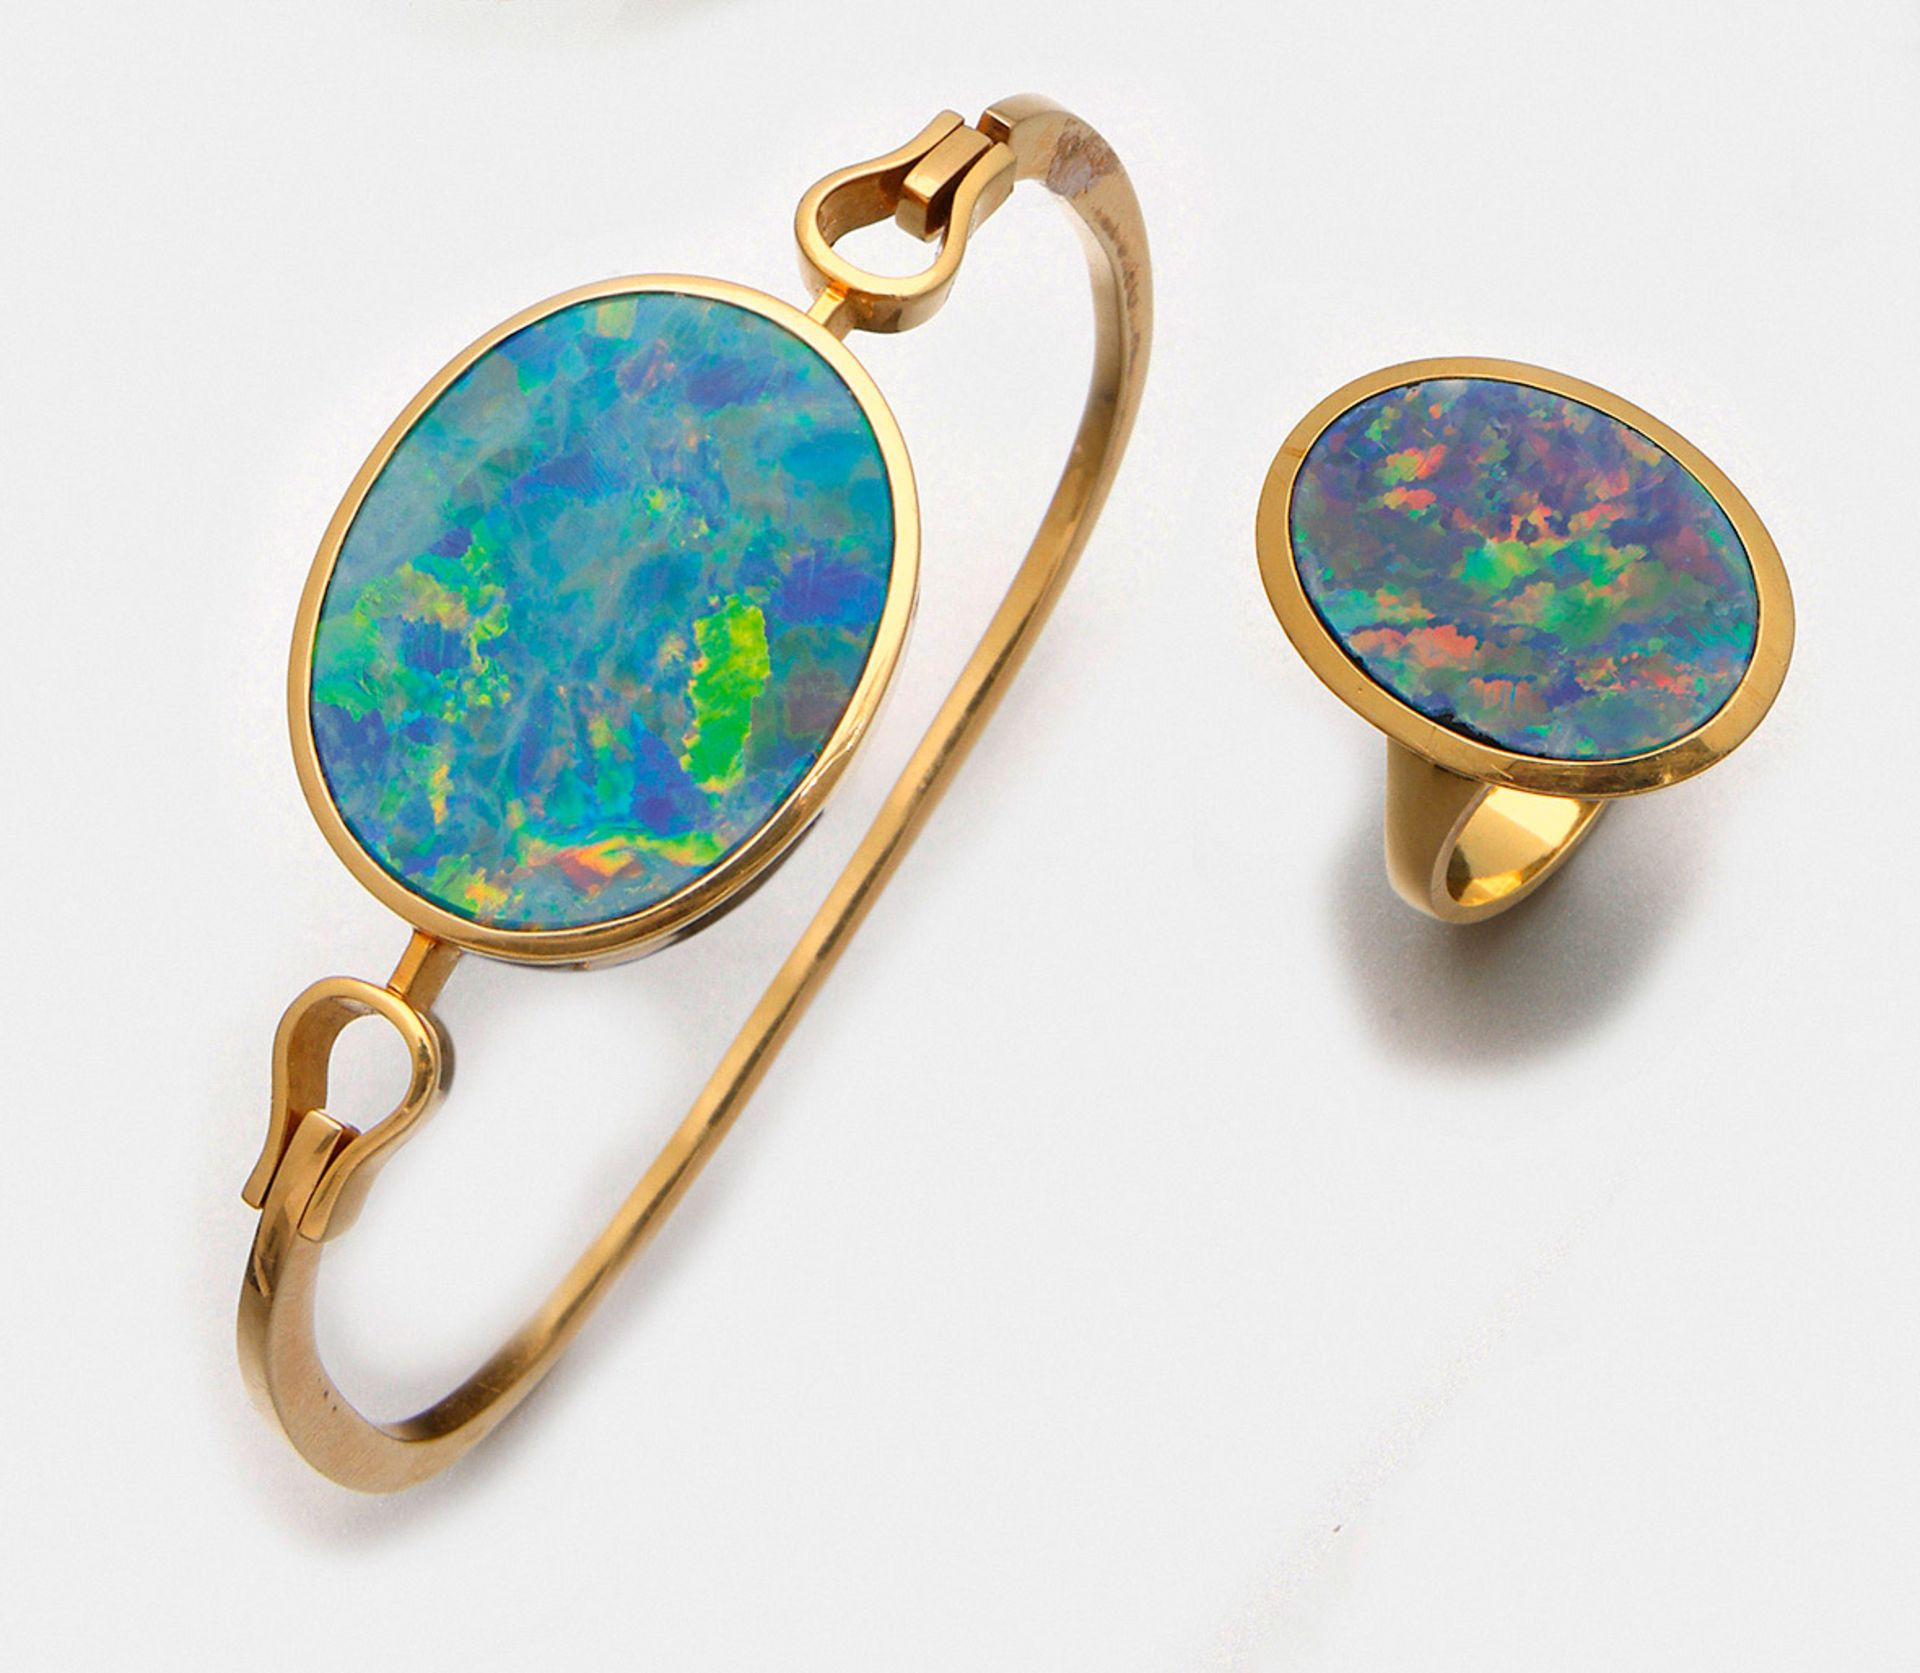 Opal-Demi Parure aus den 70er Jahren